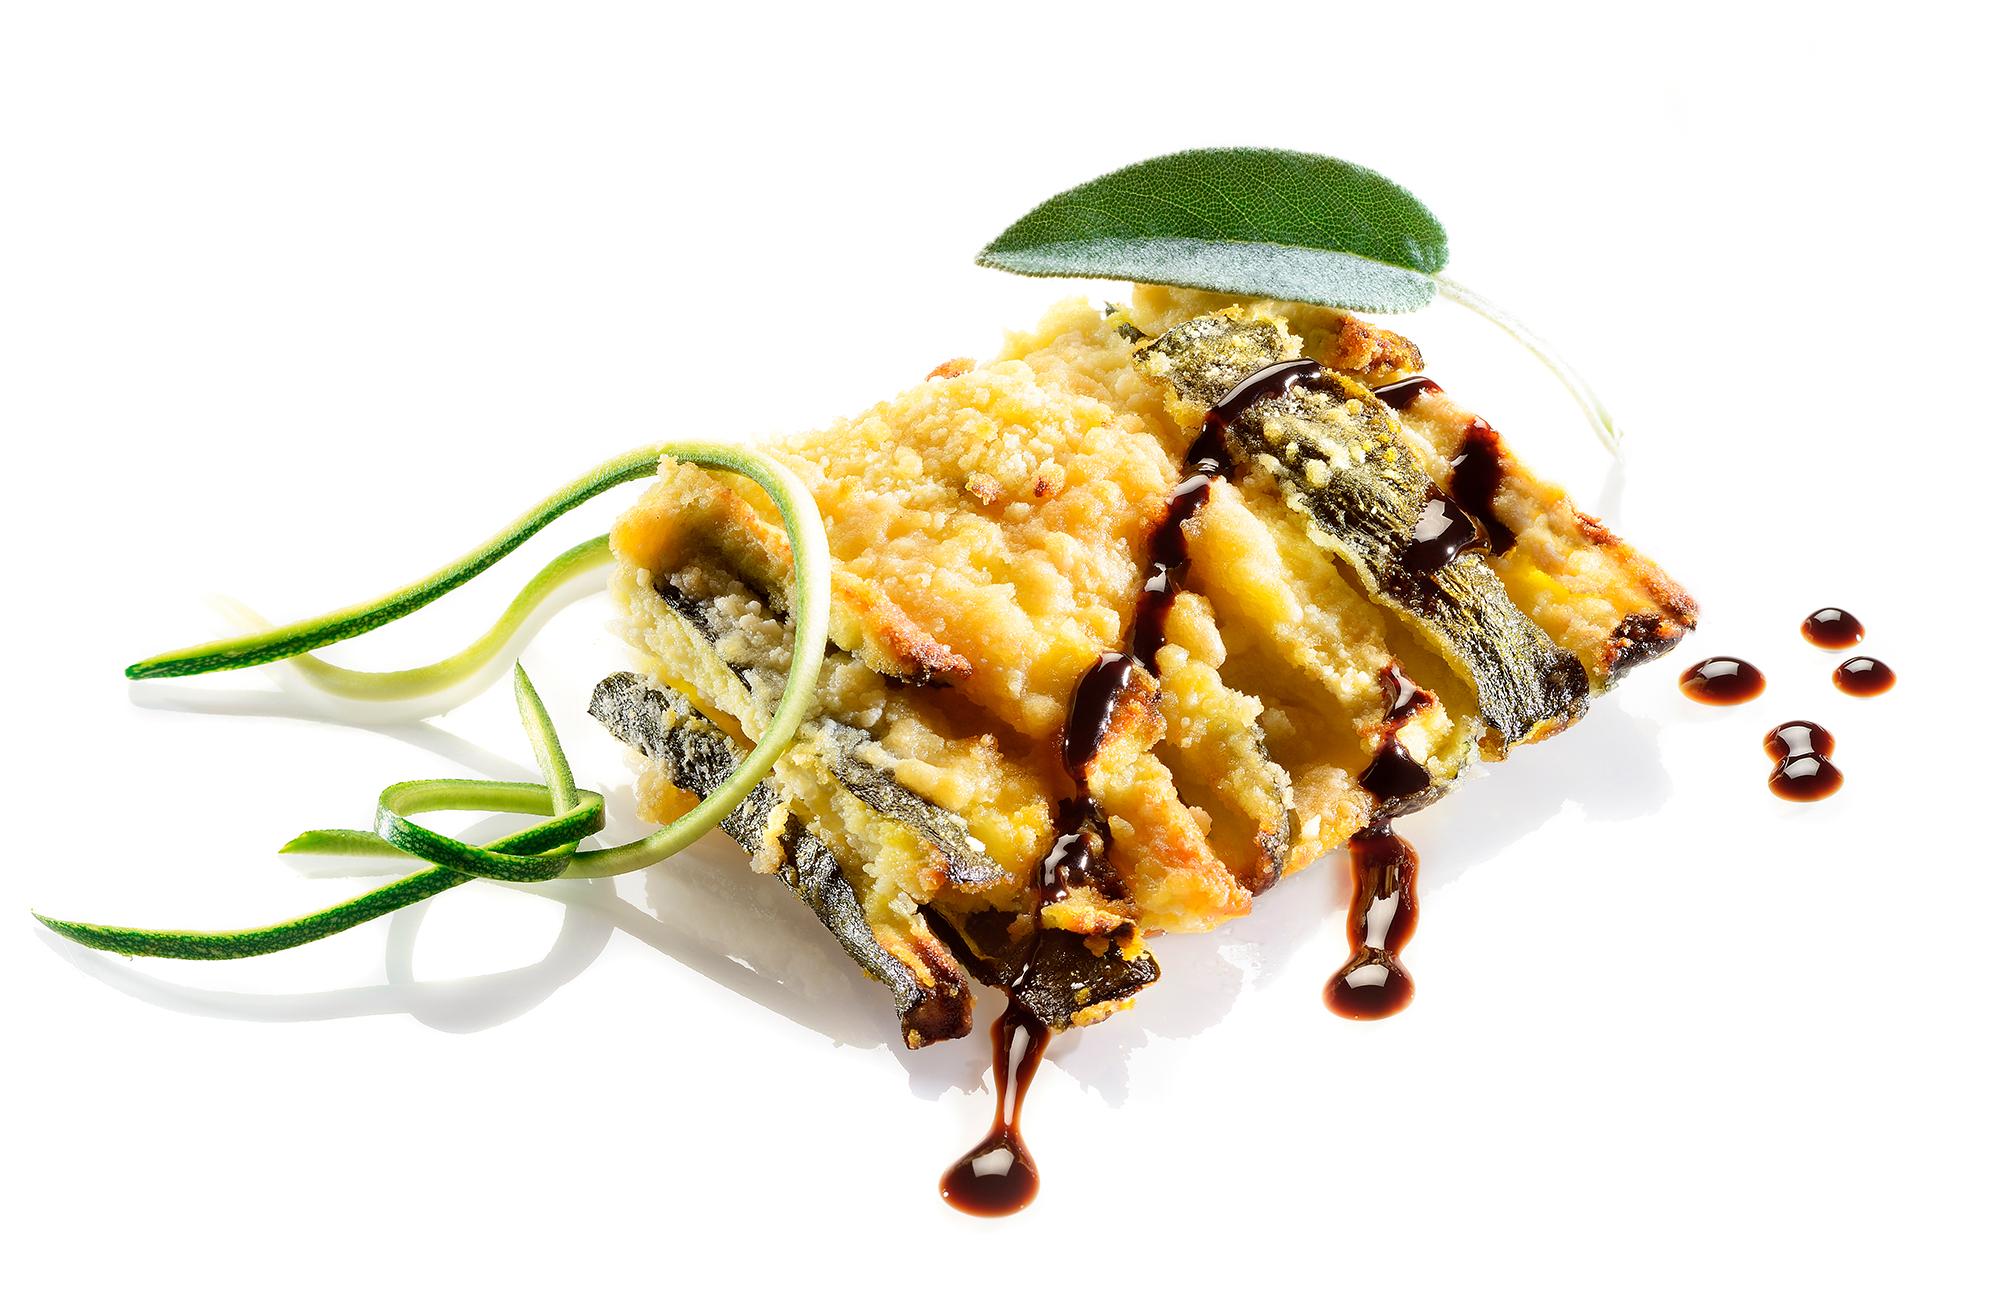 Crispy Zucchini - Ponti